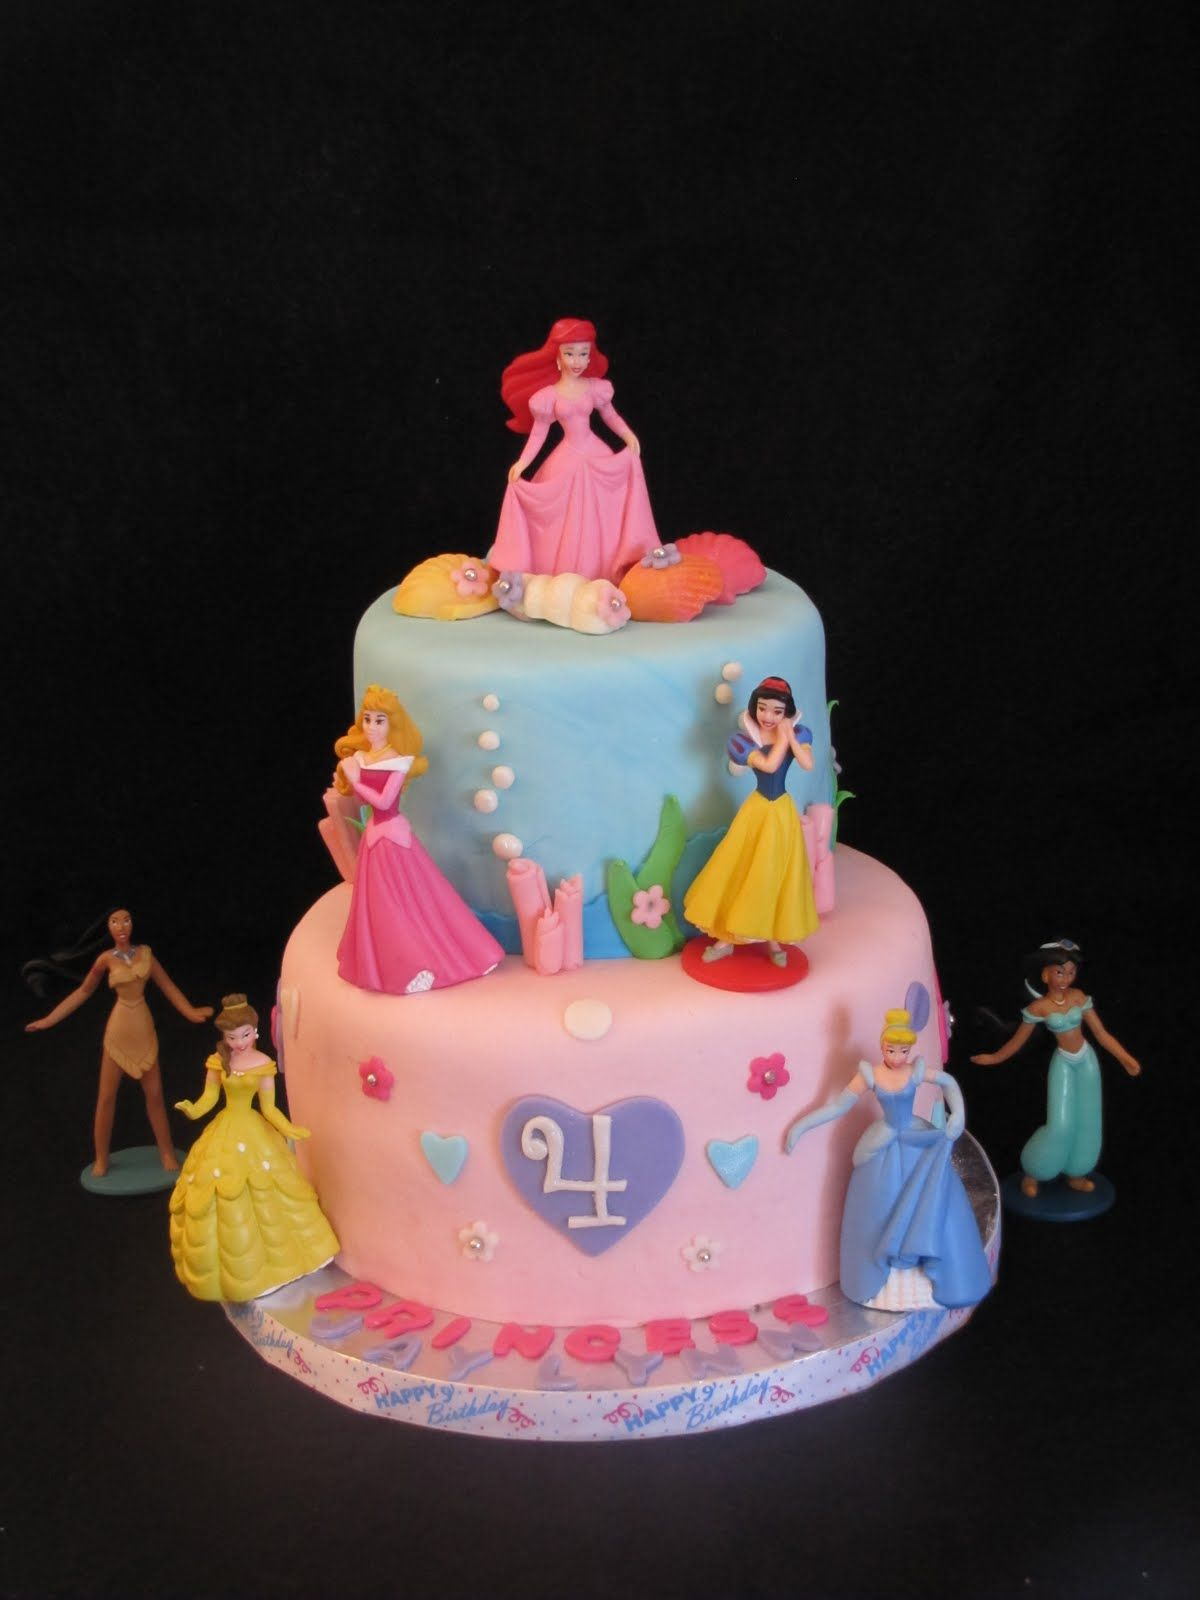 Disney Princess Themed Birthday Cake This Four Year Old Girls - Disney birthday cake ideas